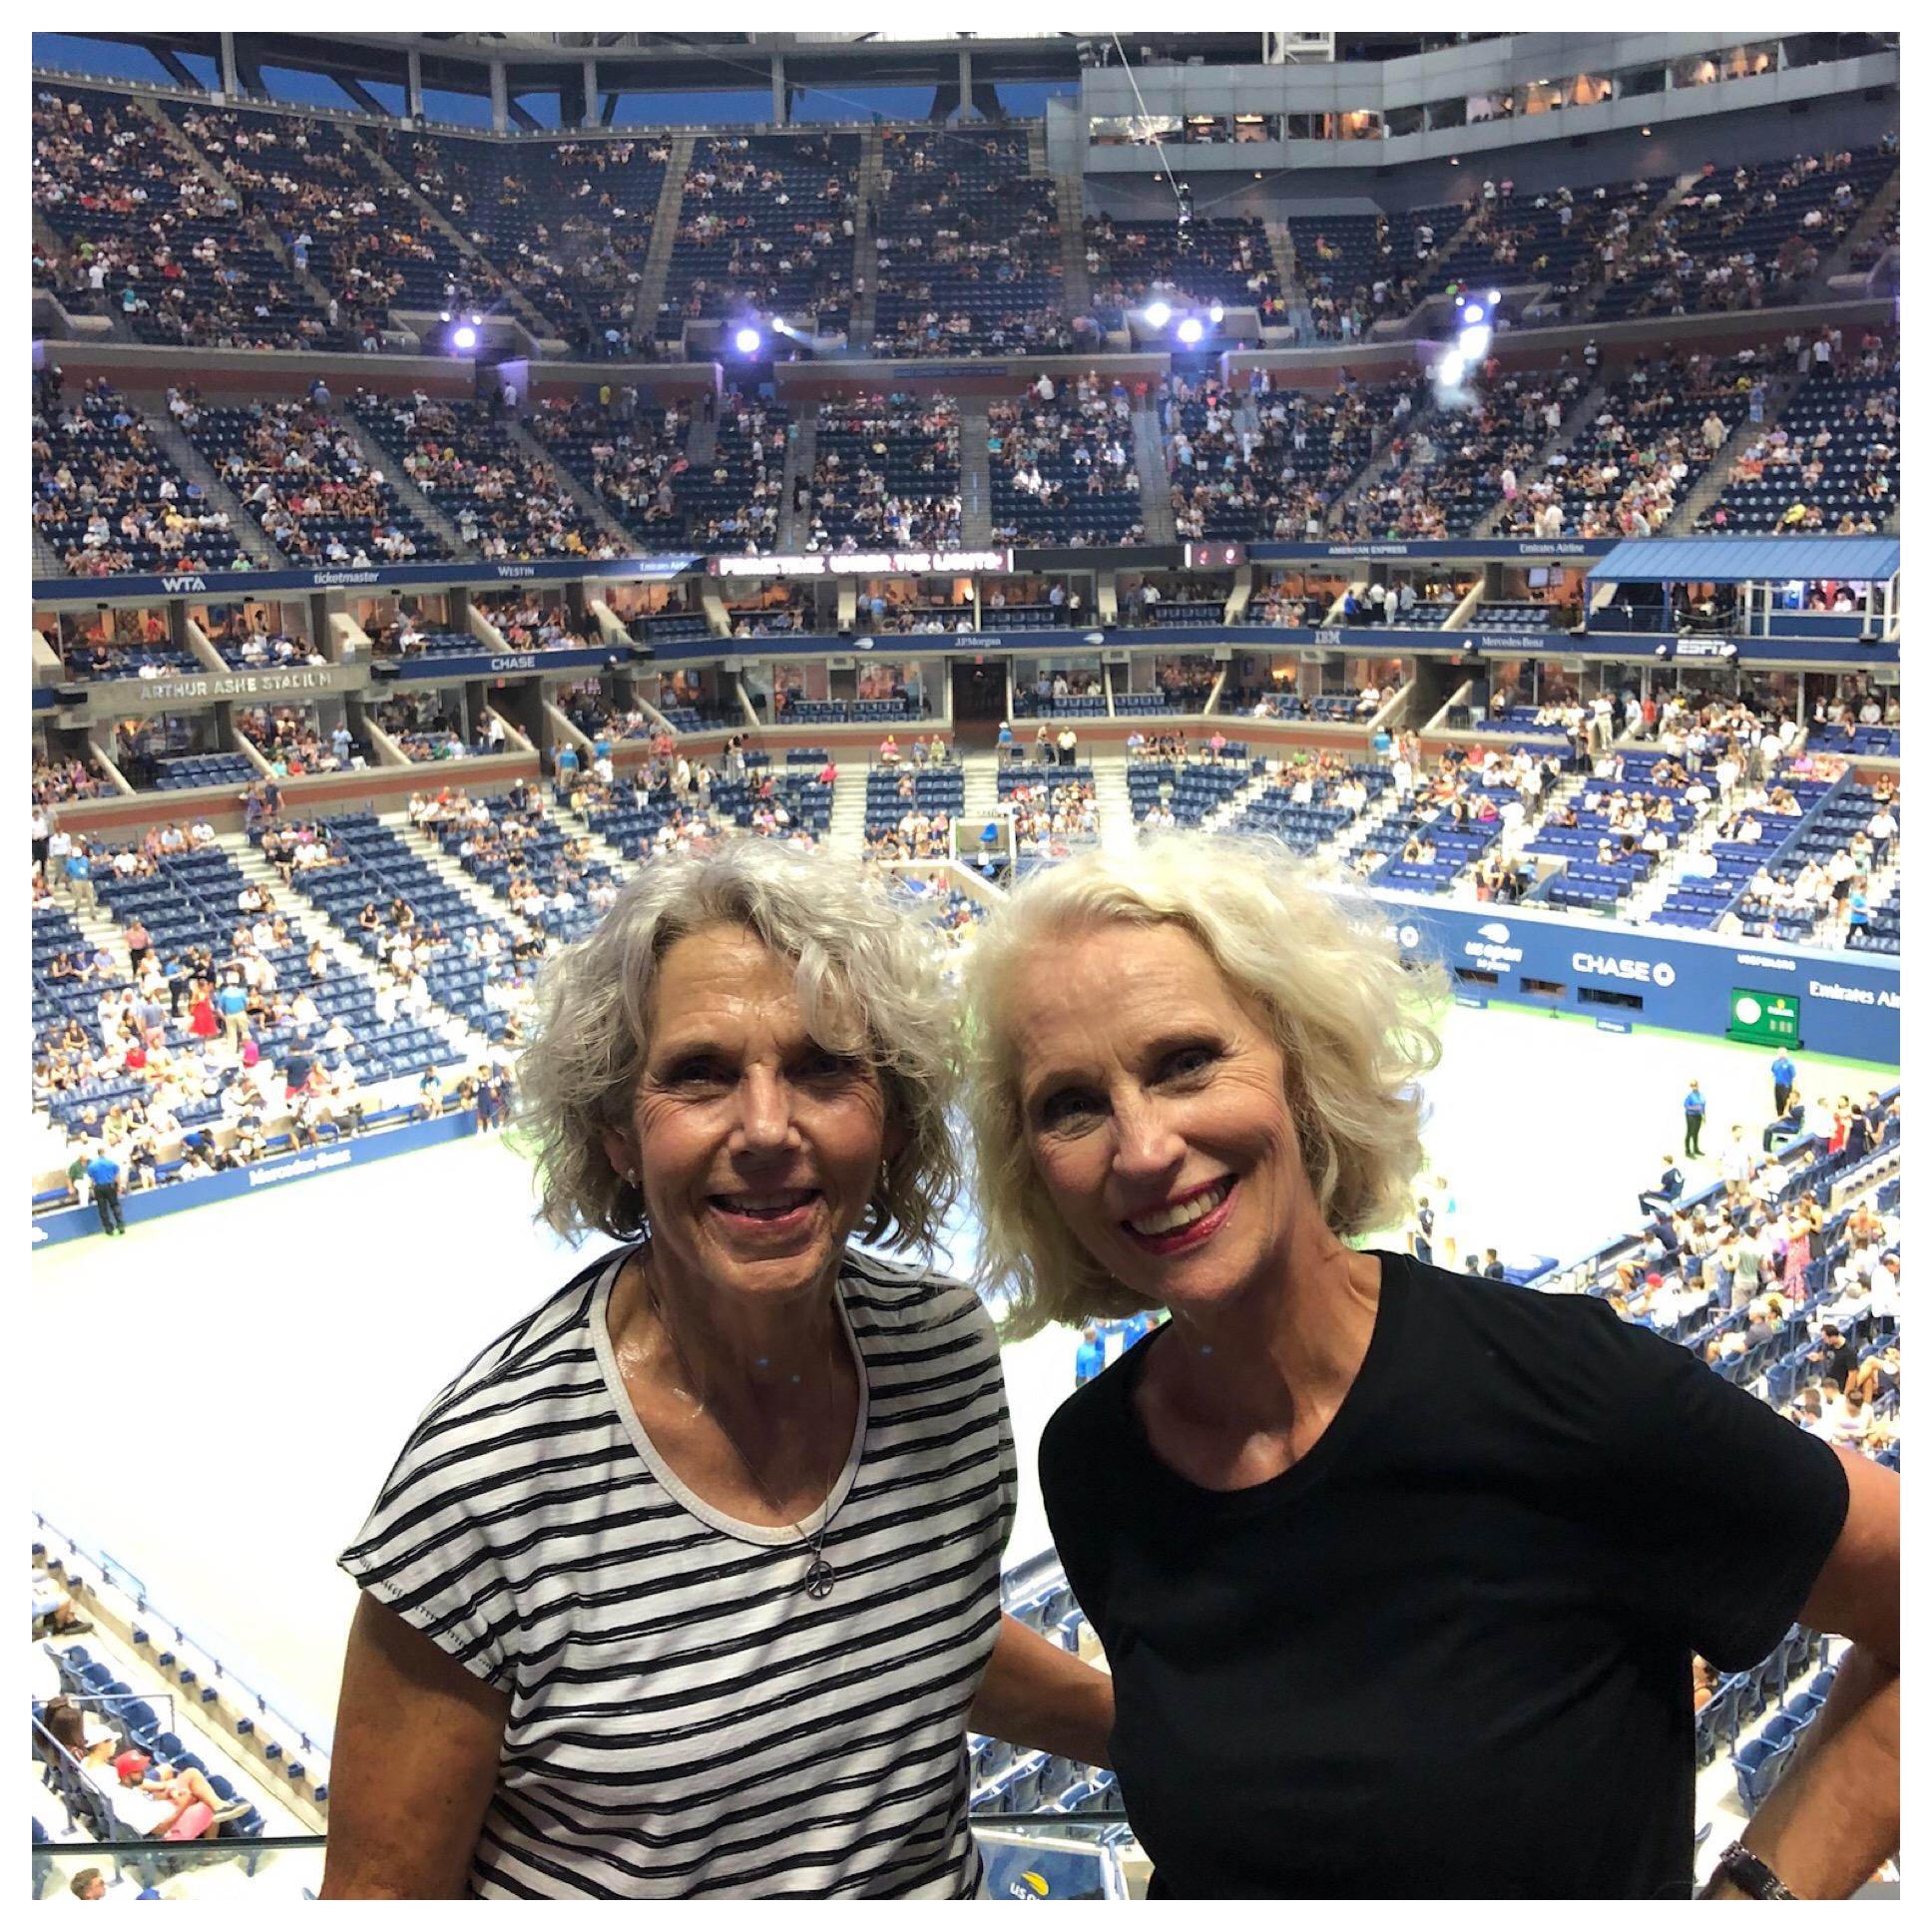 Two happy tennis fans!